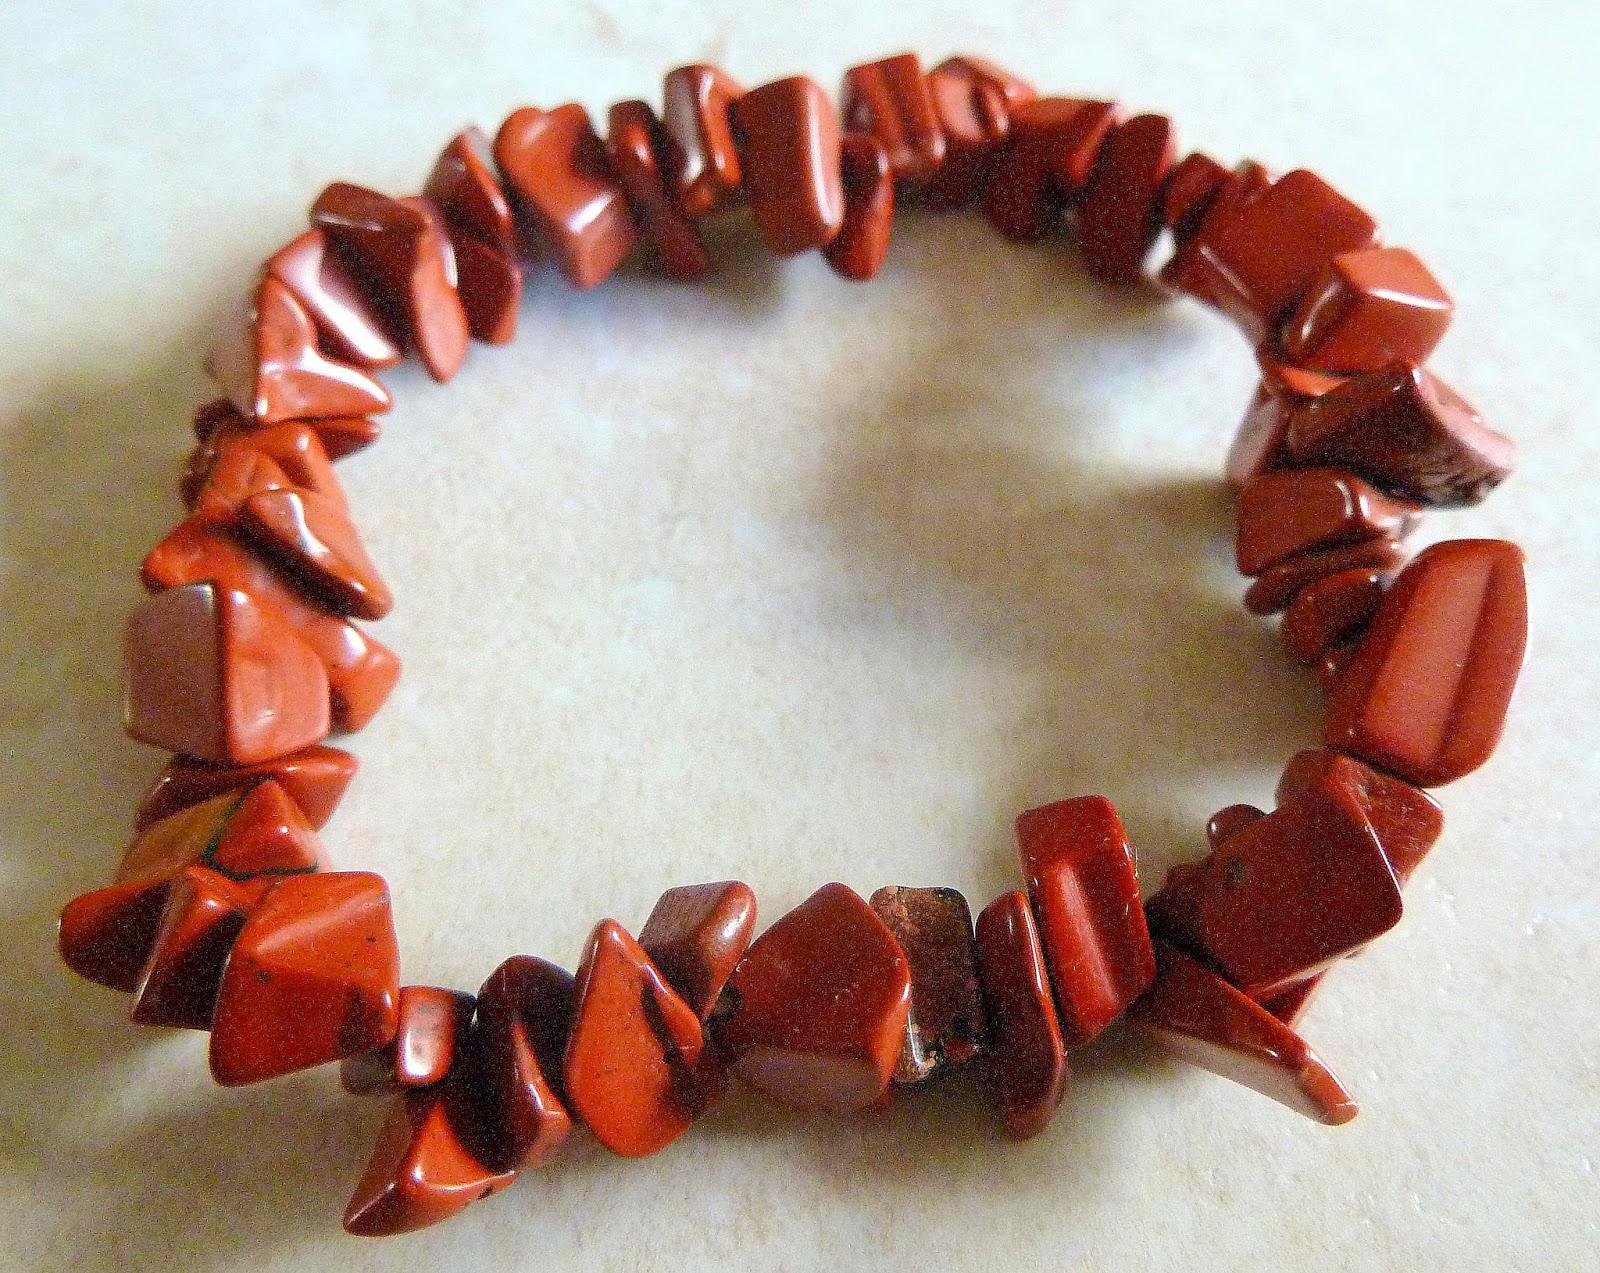 http://www.kcavintagegems.uk/red-jasper-chip-bracelet-401-p.asp